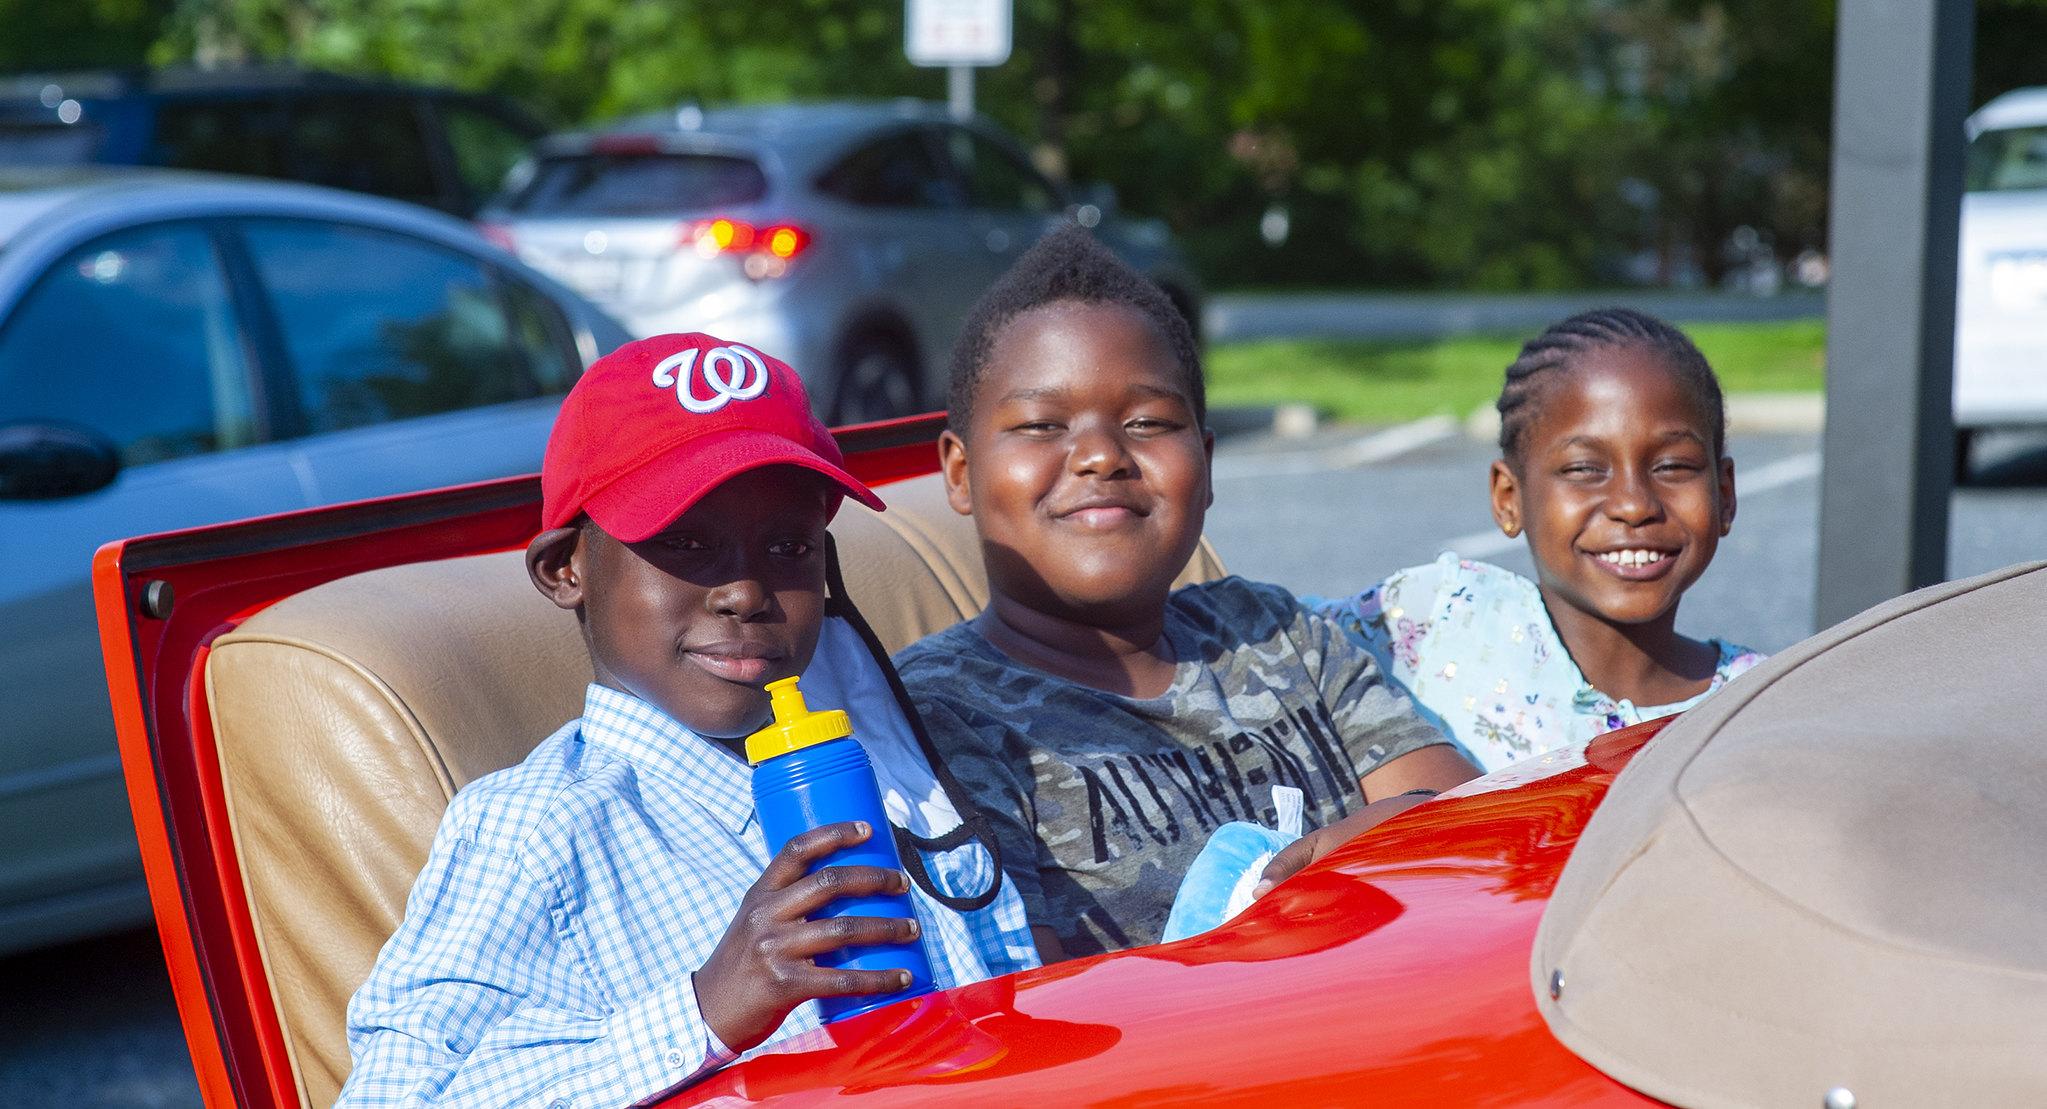 Inn residents, siblings Amani, Abel, and Amana have fun at a program